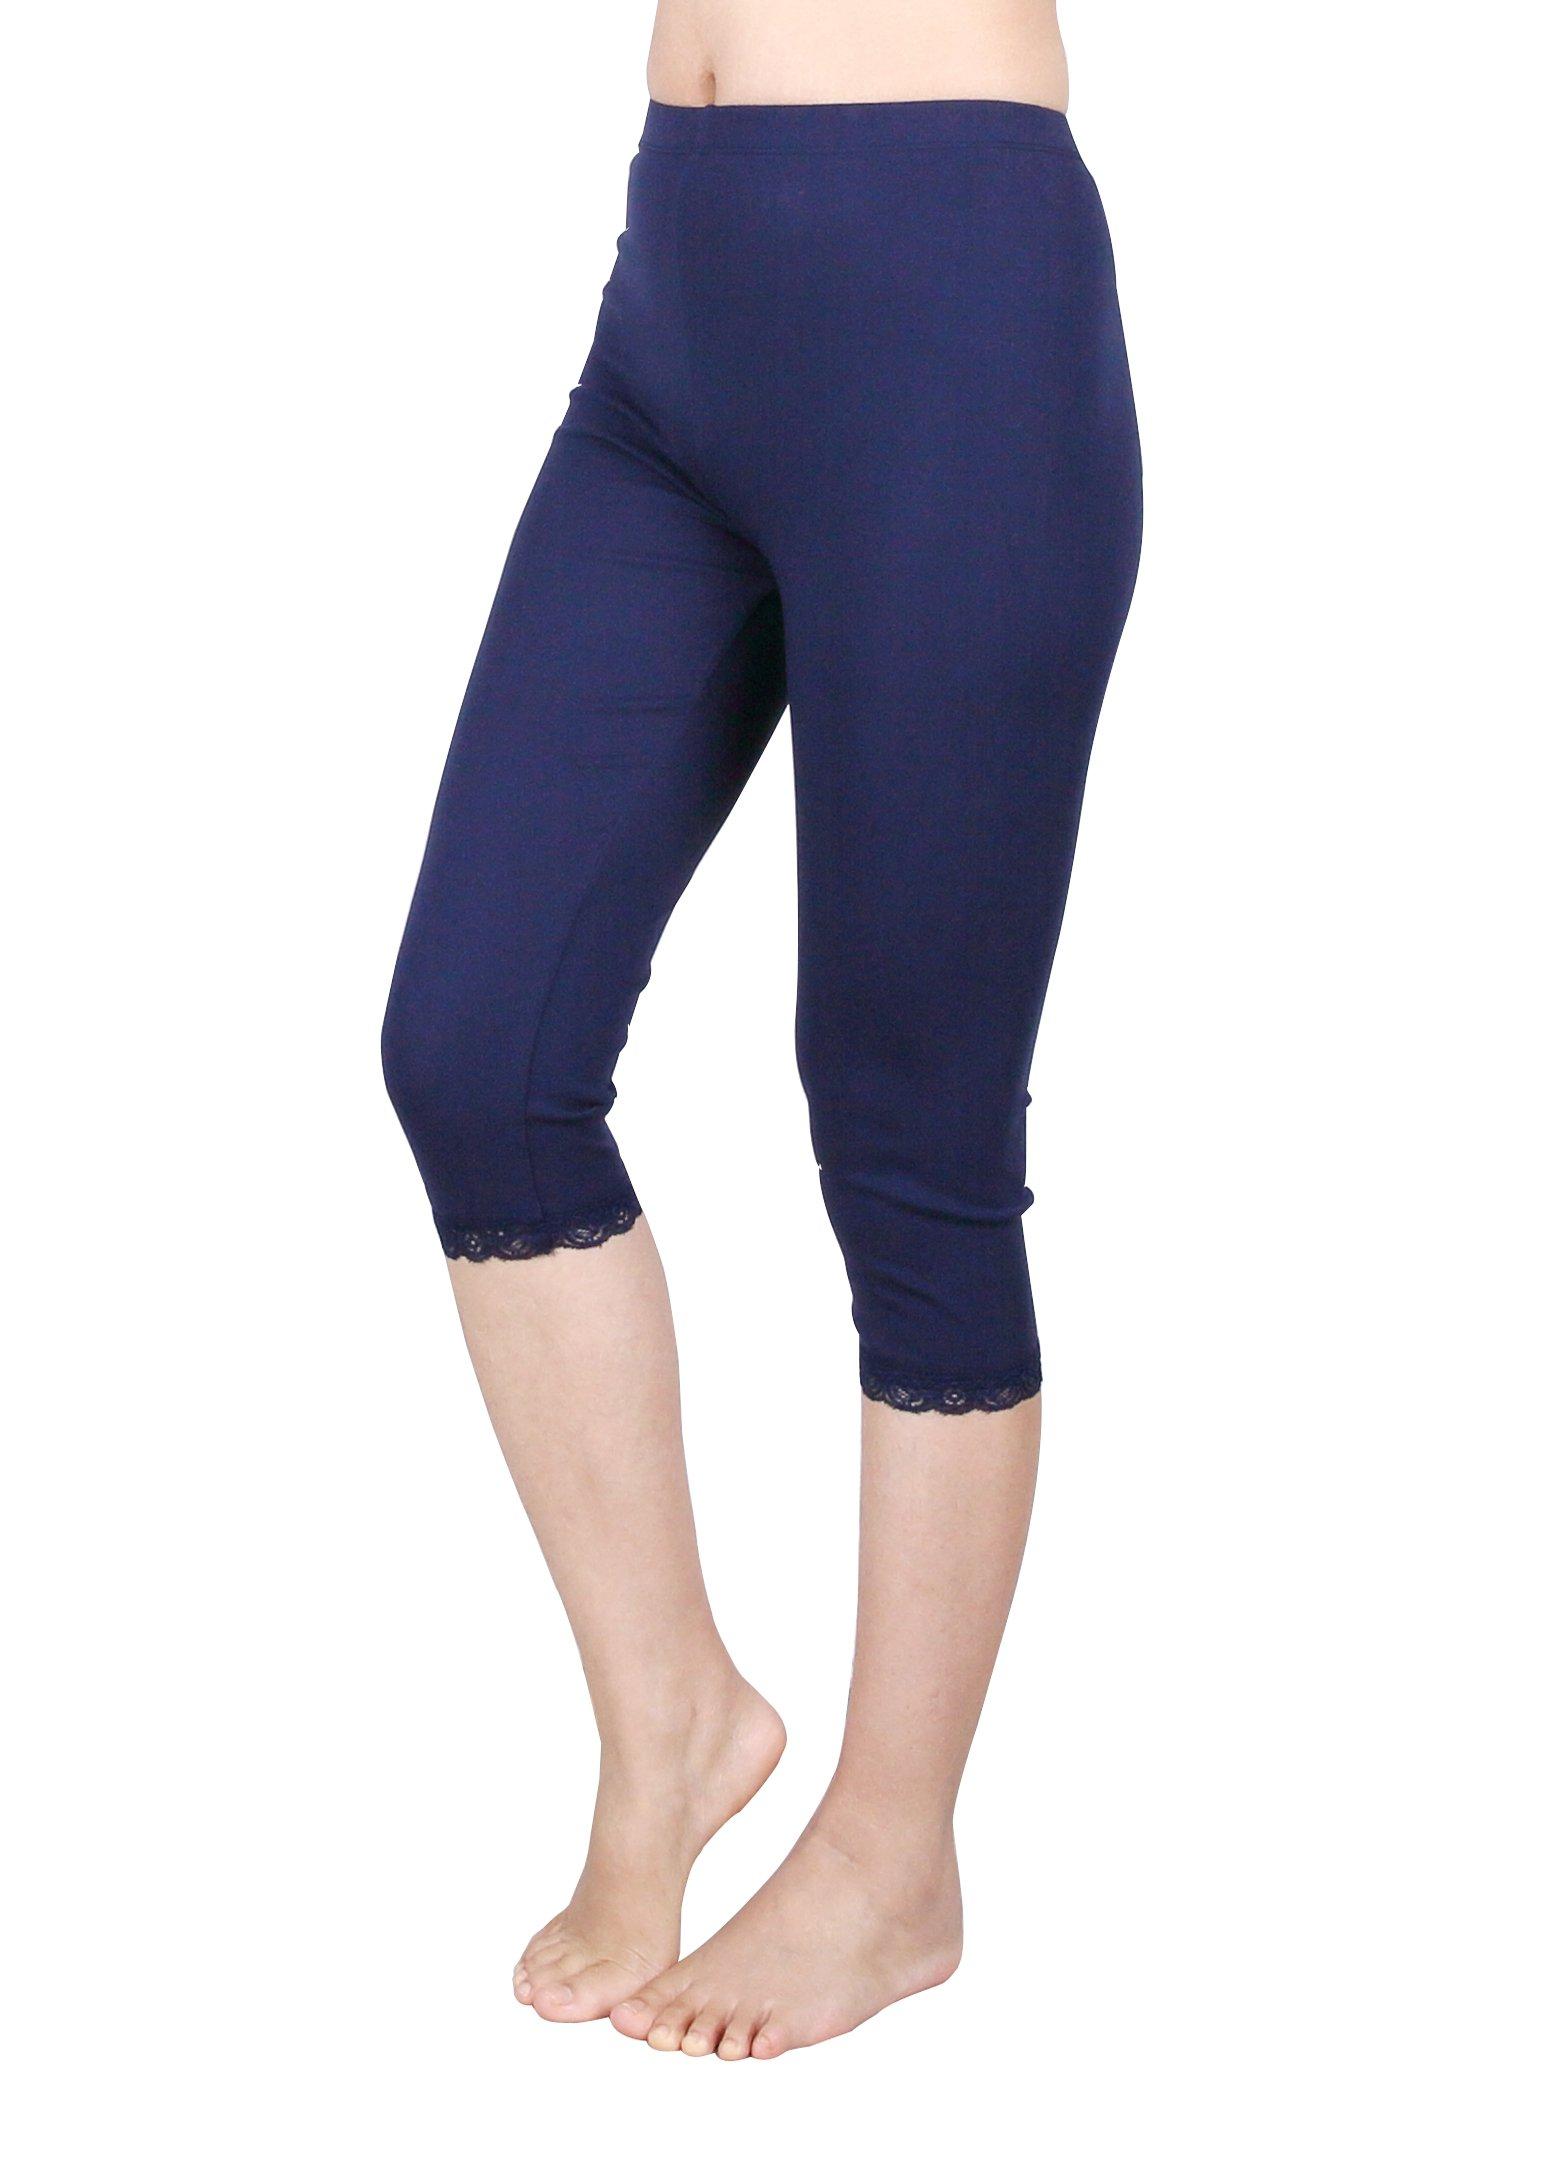 IRELIA 2 Pack Cotton Girls Leggings Capri with Lace Trim Pant Size 6-16 03 M by IRELIA (Image #3)